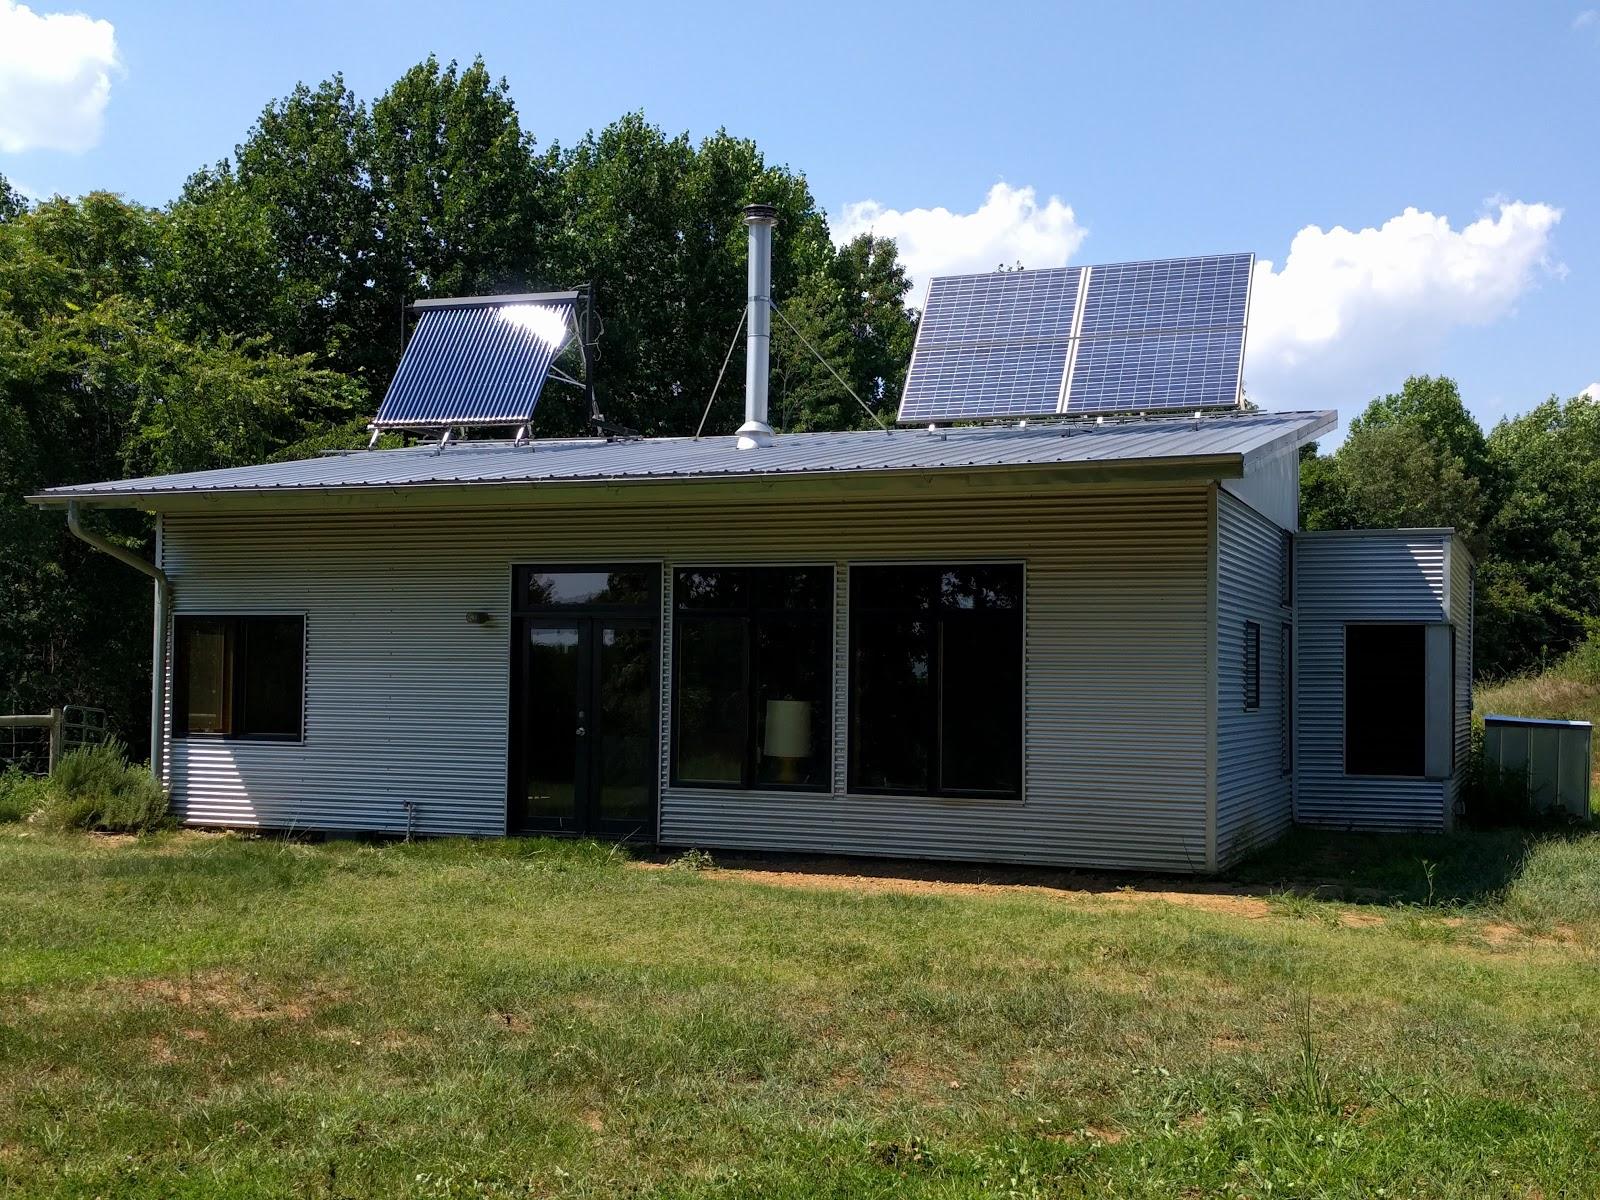 Modern Off Grid Prefab House Enjoys Summer Breeze And Code